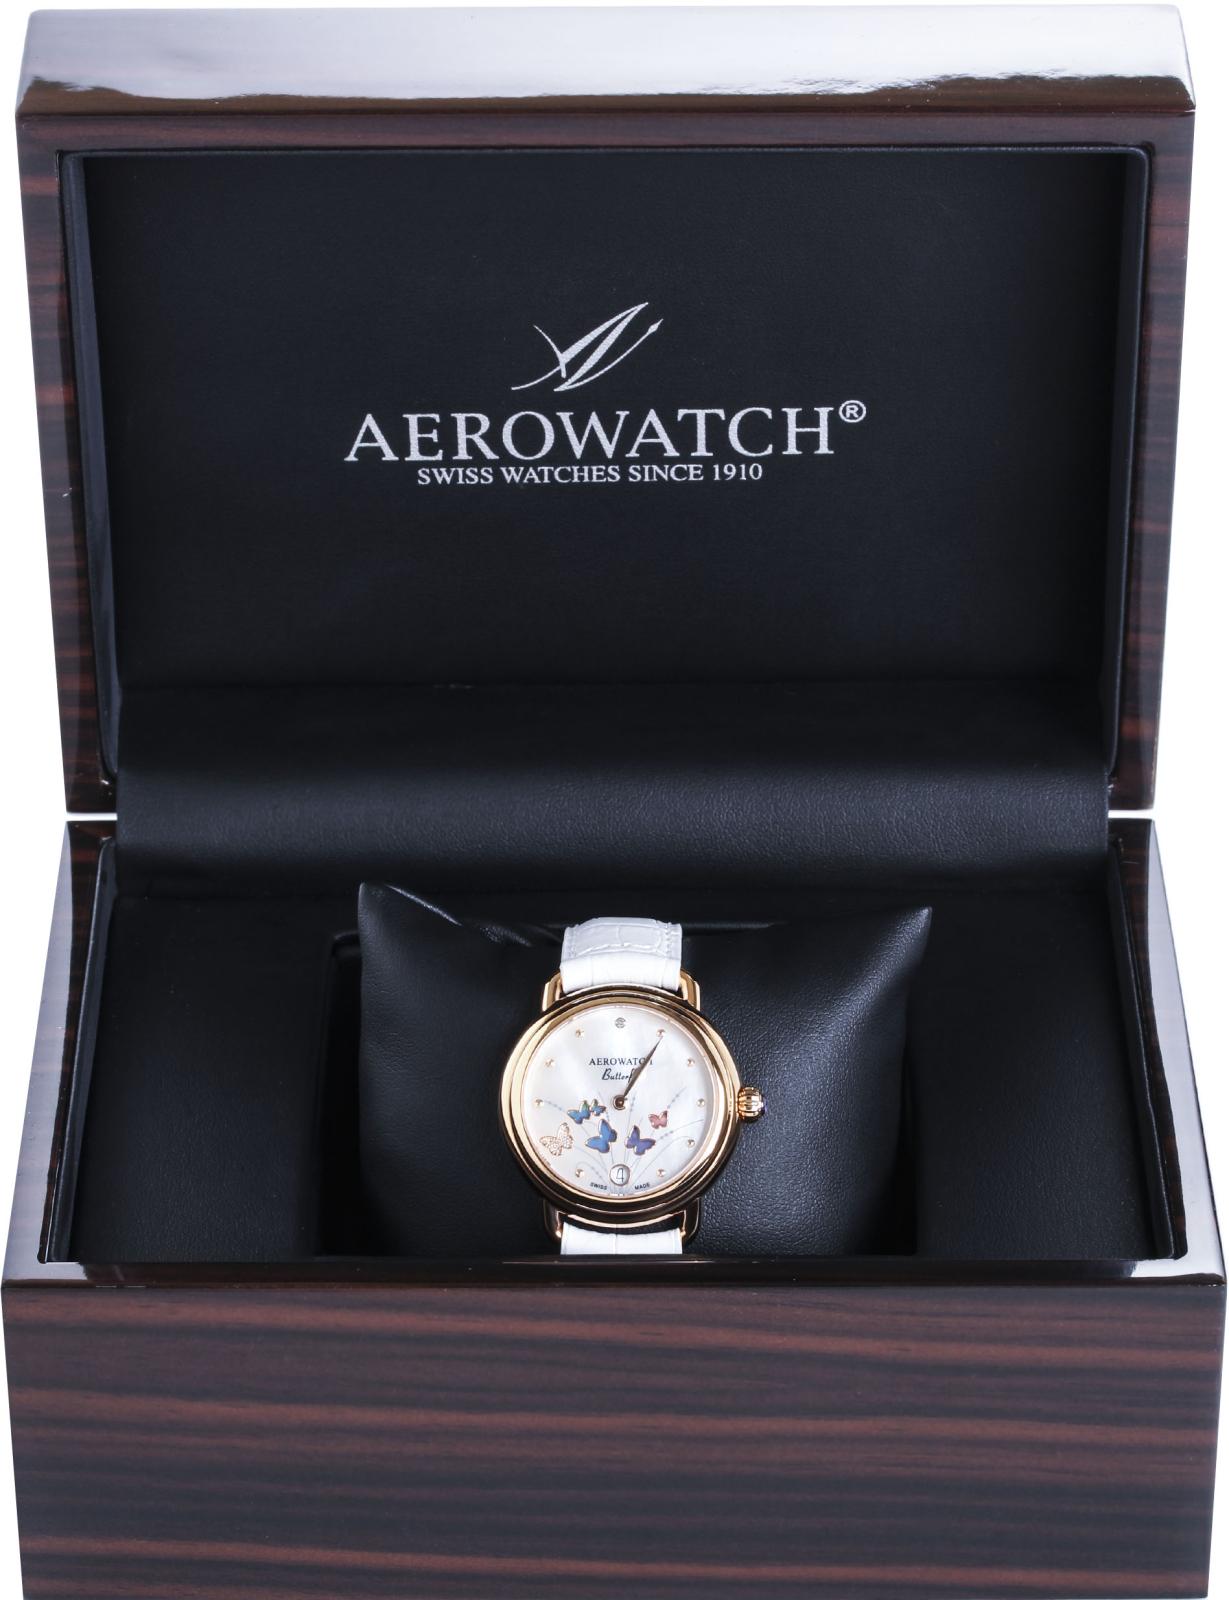 Aerowatch 1942 Butterfly 44960 RO05Наручные часы<br>Швейцарские часы Aerowatch 1942 Butterfly 44960 RO05<br><br>Пол: Женские<br>Страна-производитель: Швейцария<br>Механизм: Кварцевый<br>Материал корпуса: Сталь<br>Материал ремня/браслета: Кожа<br>Водозащита, диапазон: None<br>Стекло: Сапфировое<br>Толщина корпуса: None<br>Стиль: None